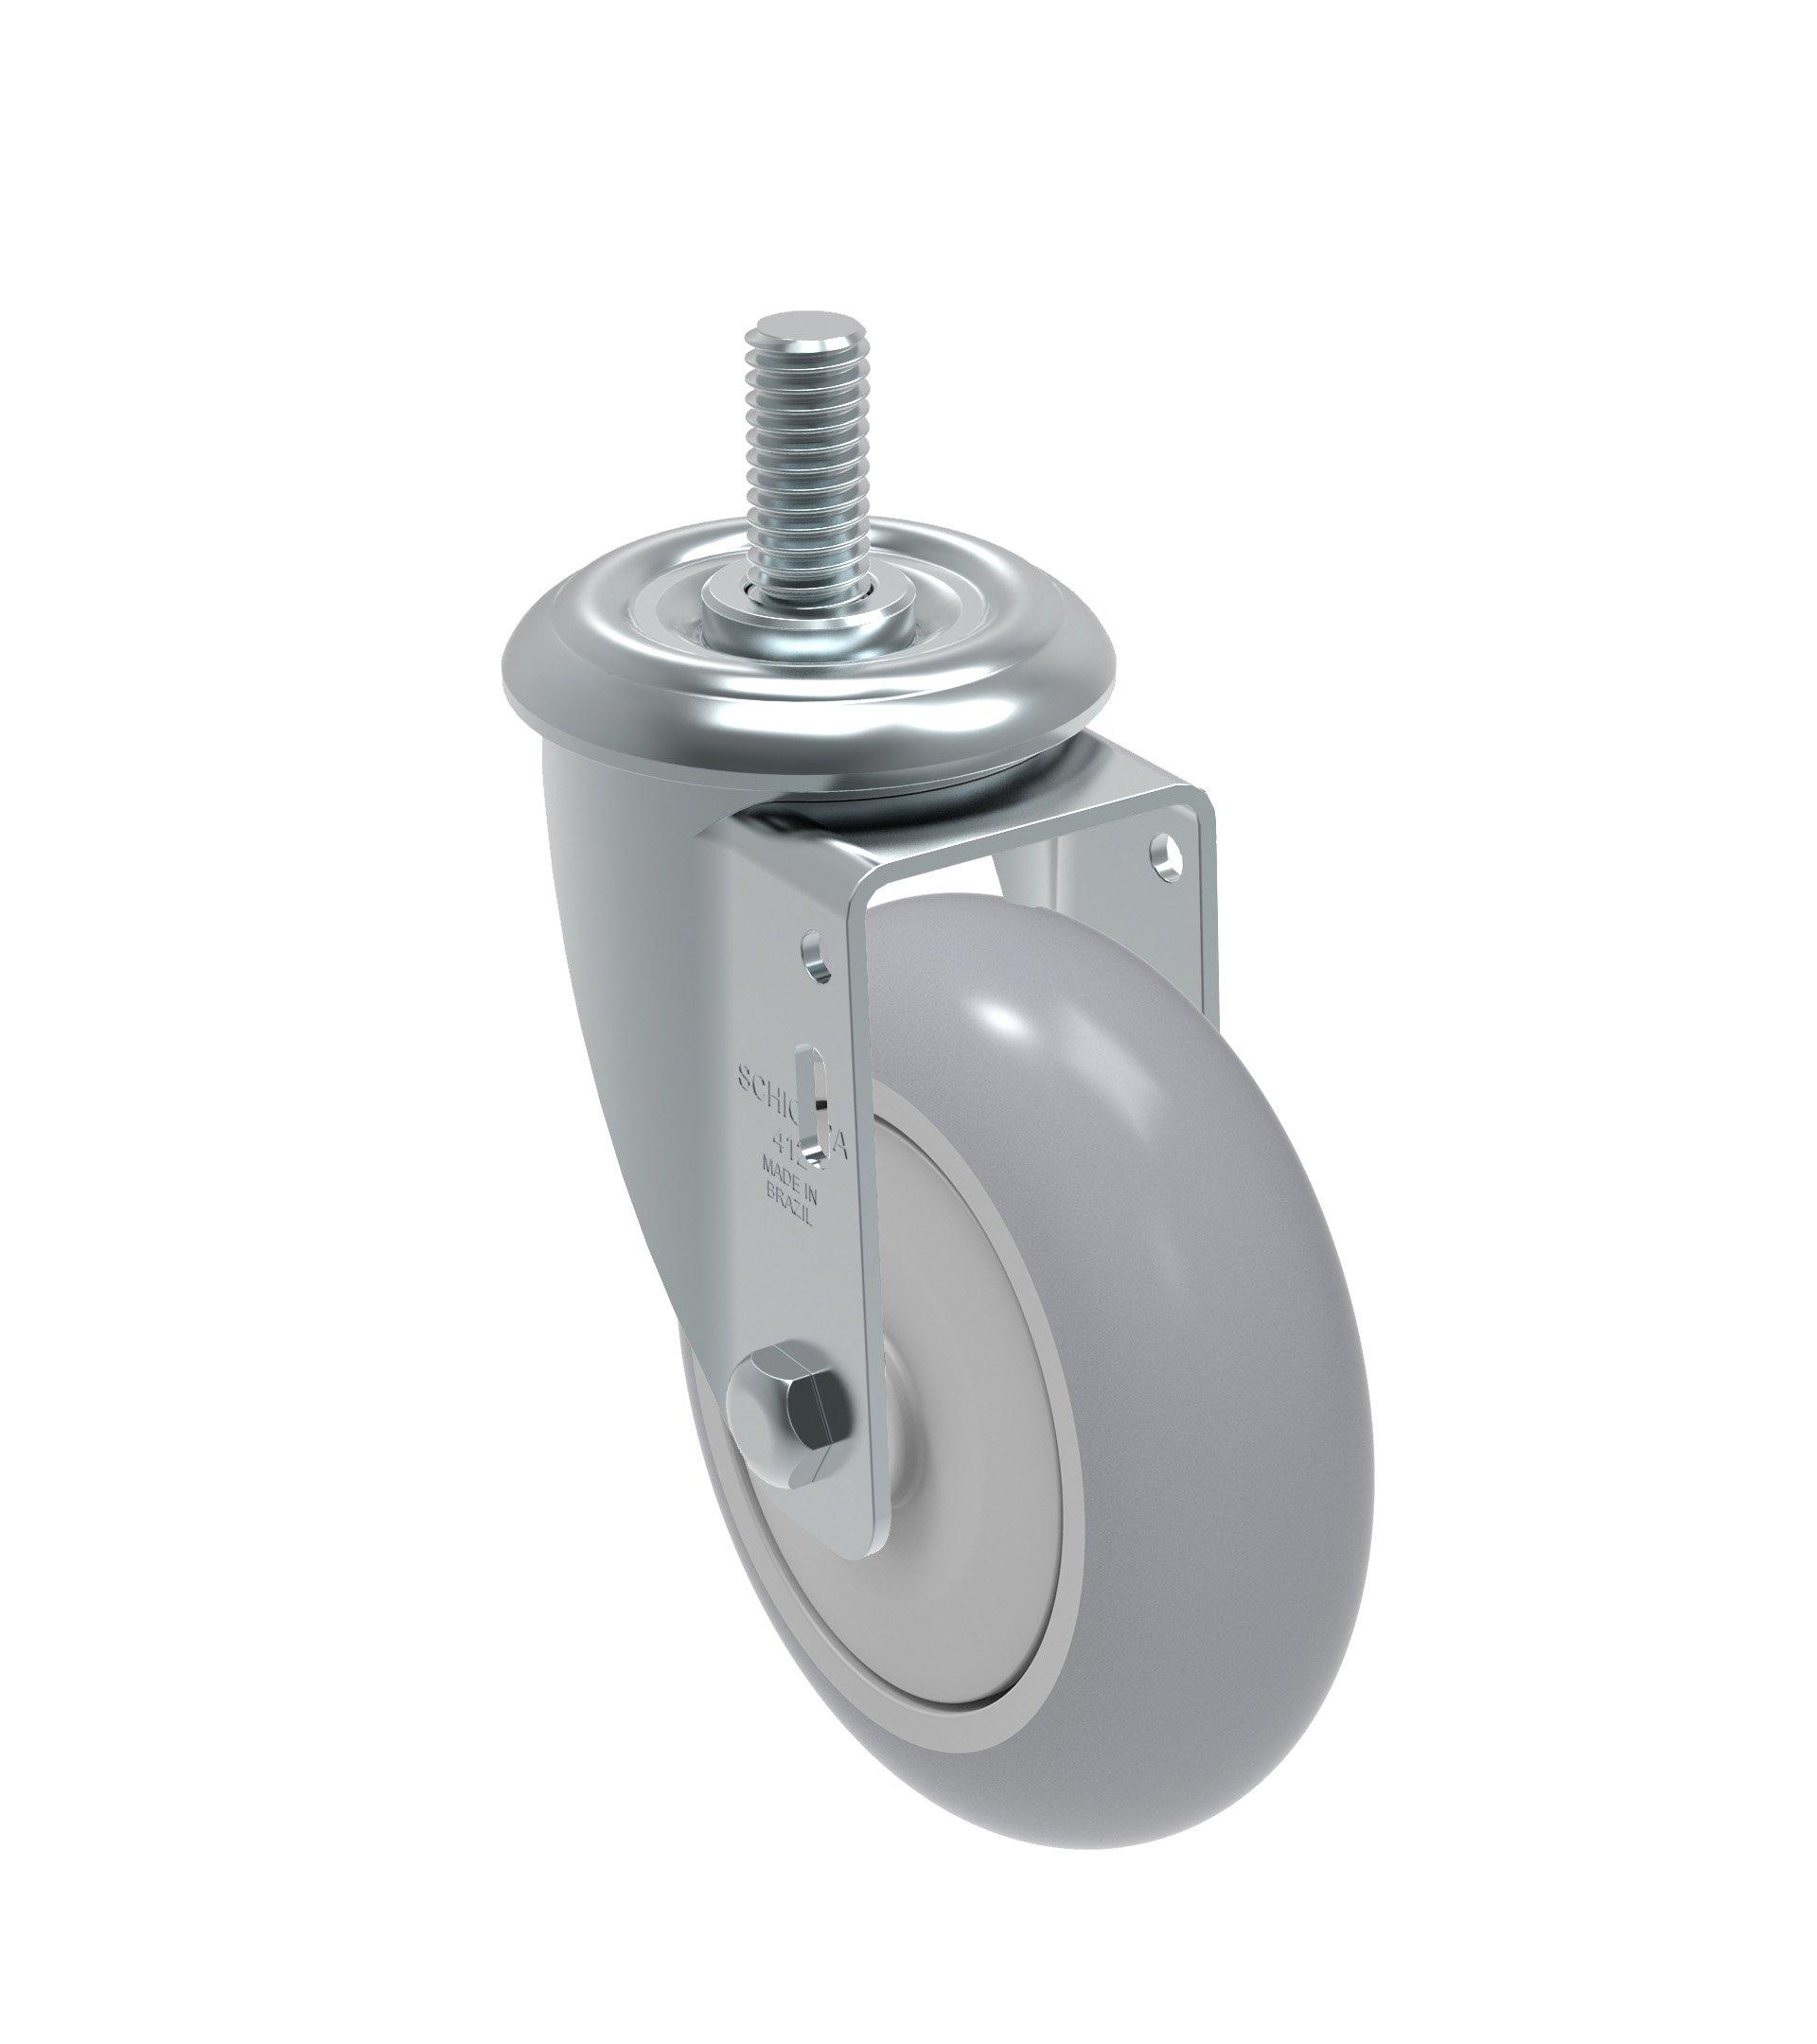 Schioppa GLEHF 412 SPE - Flat Tread L12 Series 4'' x 1-1/4'' Diameter Swivel Caster, Non-Marking Extra Soft Thermoplastic Rubber Precision Ball Bearing Wheel, 12 mm Diameter x 40 mm Length Threaded Stem, 185 lb